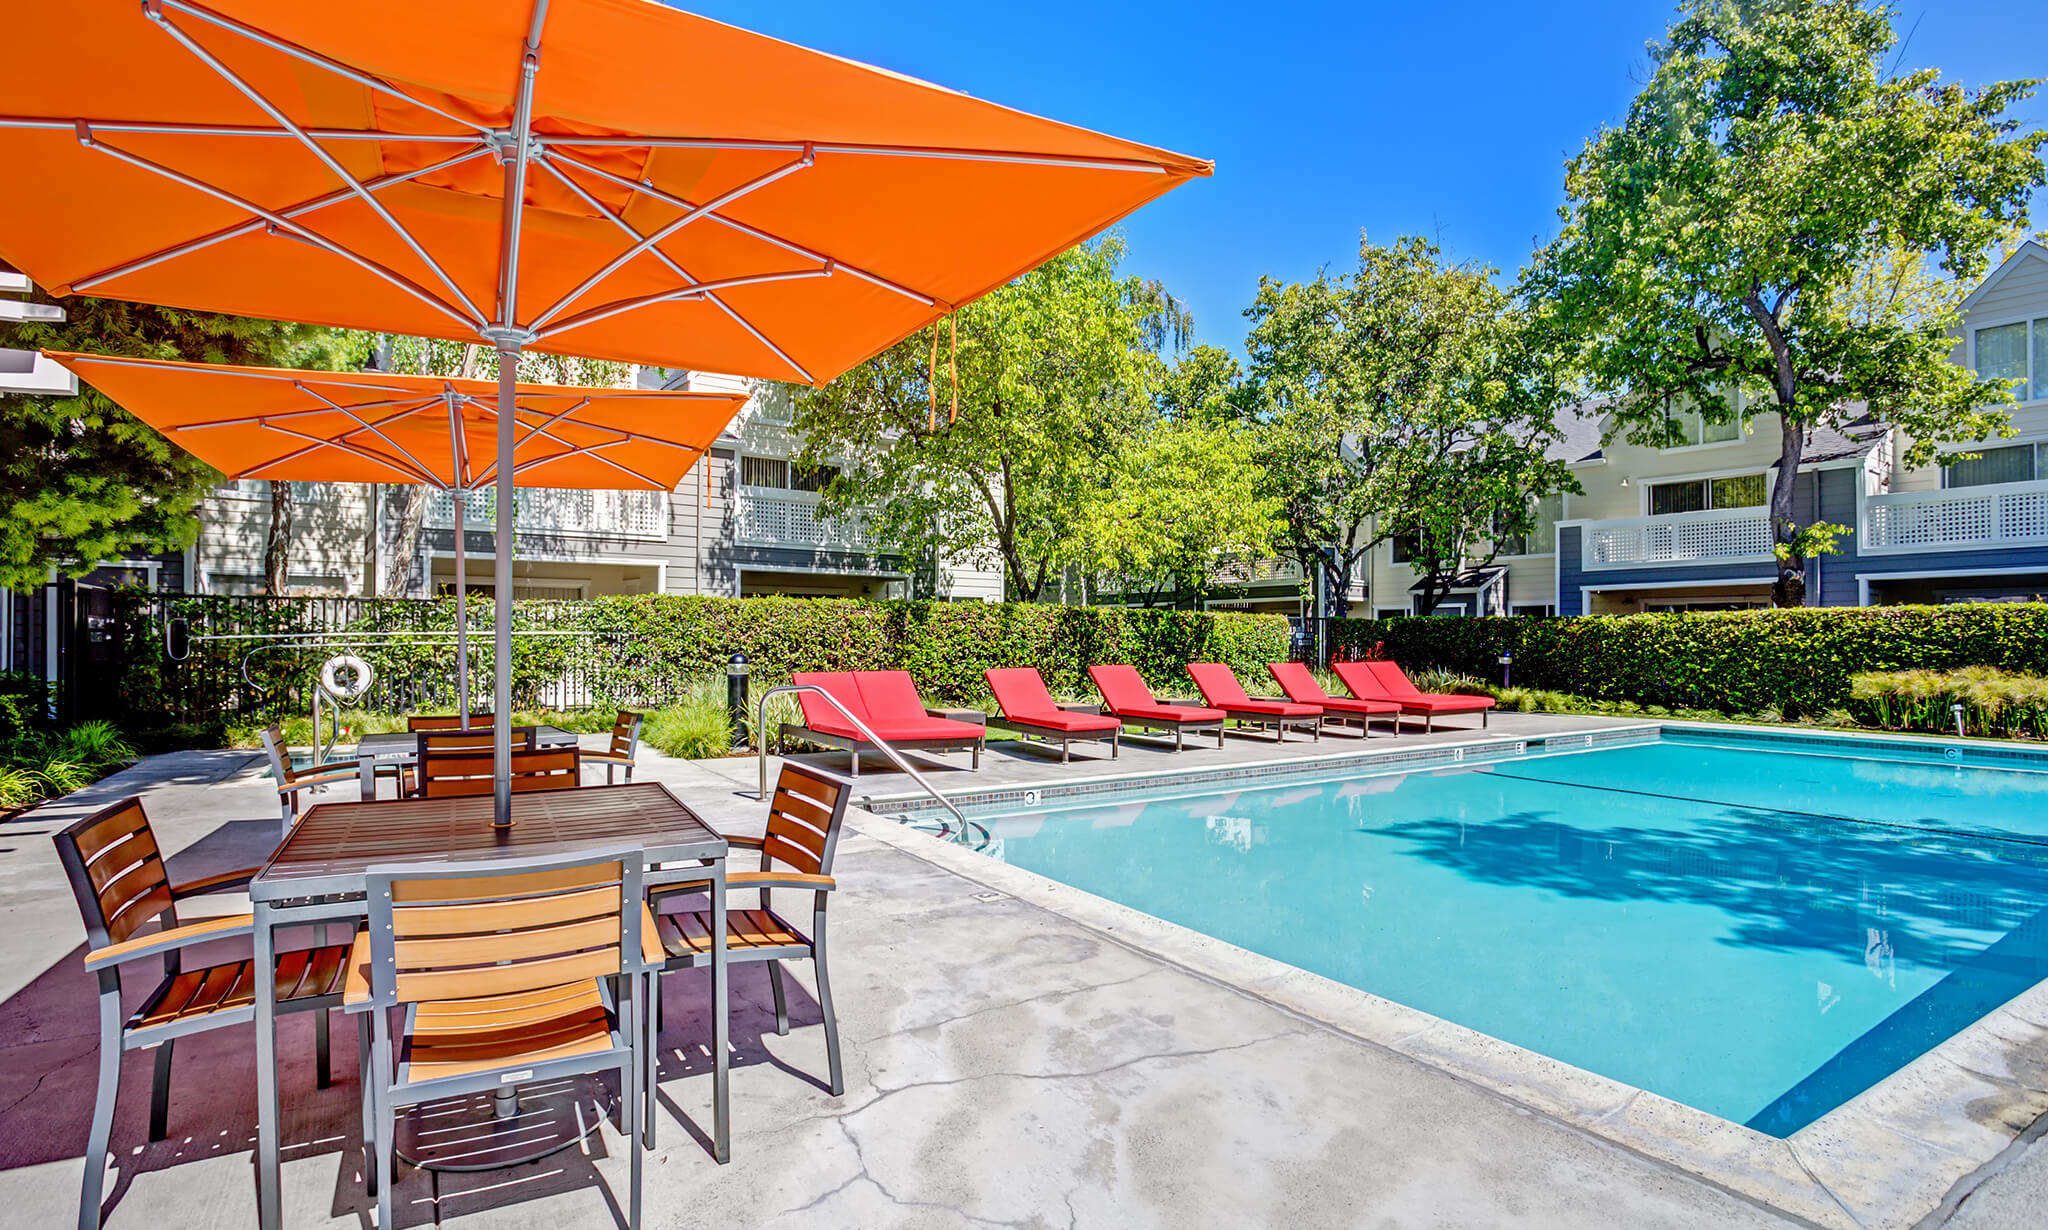 Timberleaf Apartments apartments in Santa Clara CA to rent photo 6